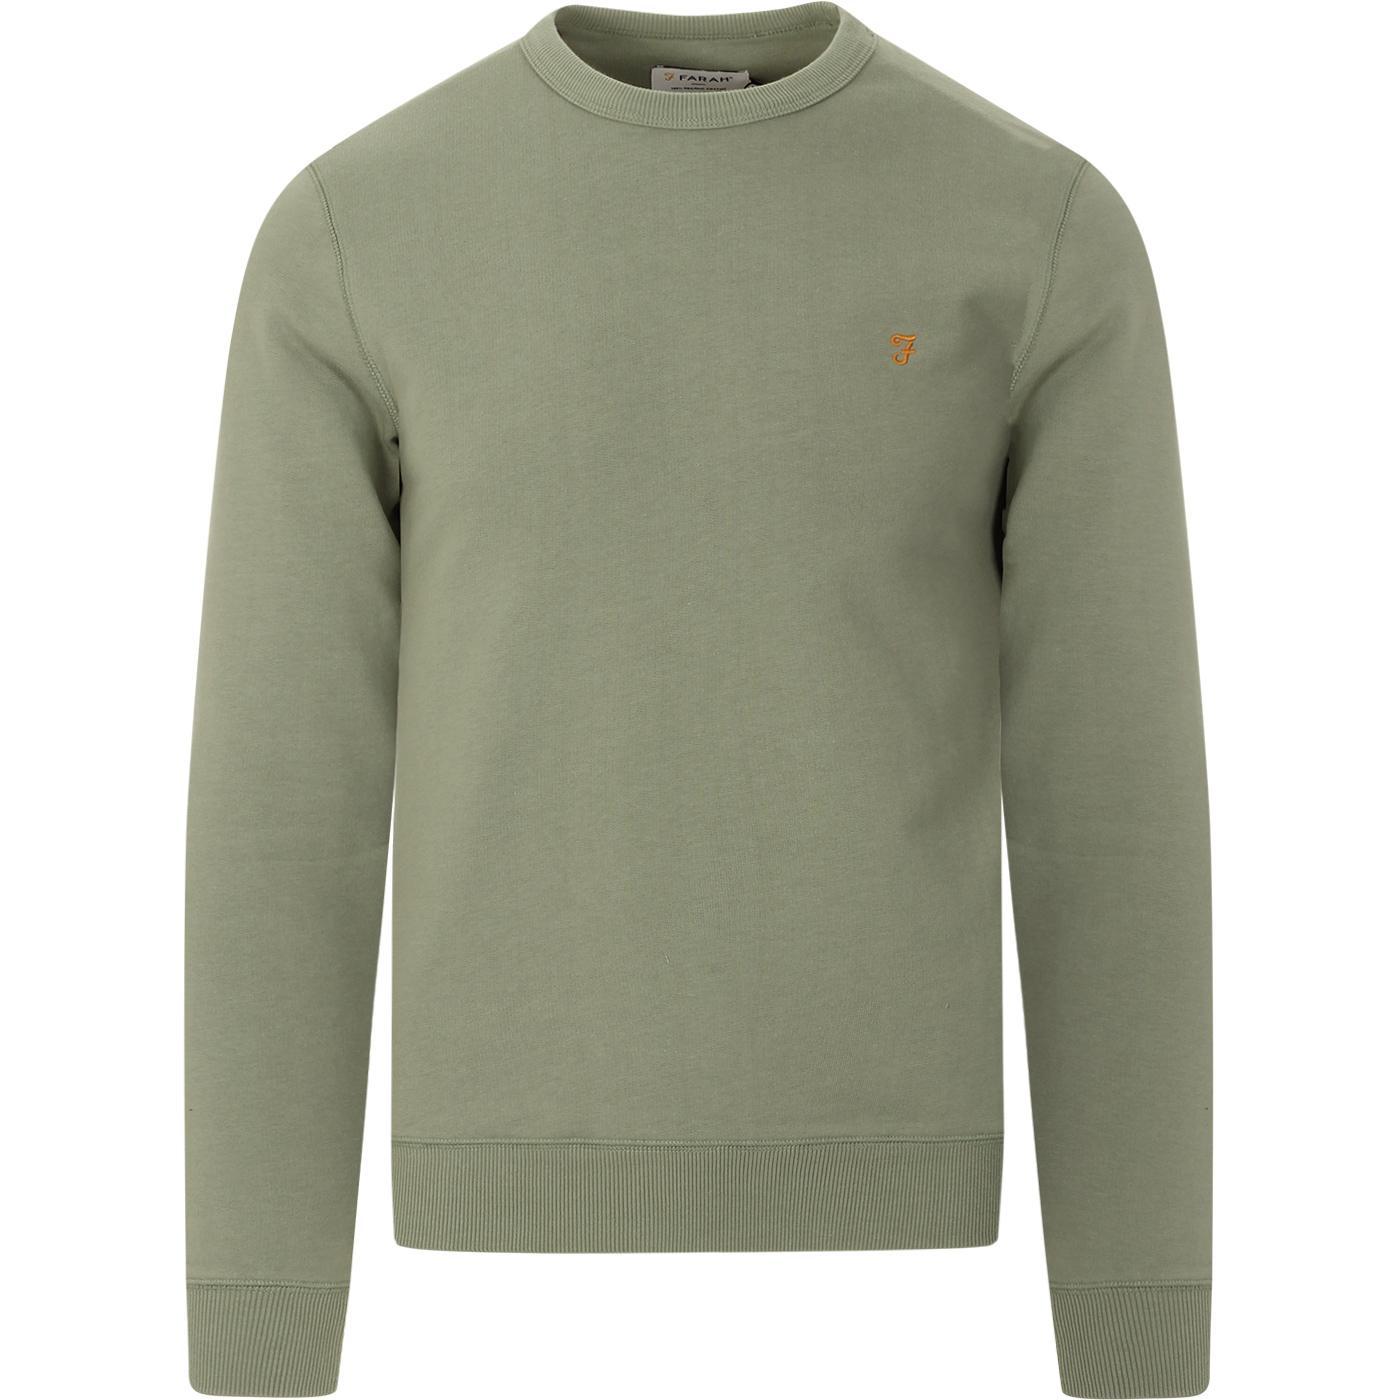 Tim FARAH Retro Crew Neck Sweatshirt (Lily Pad)